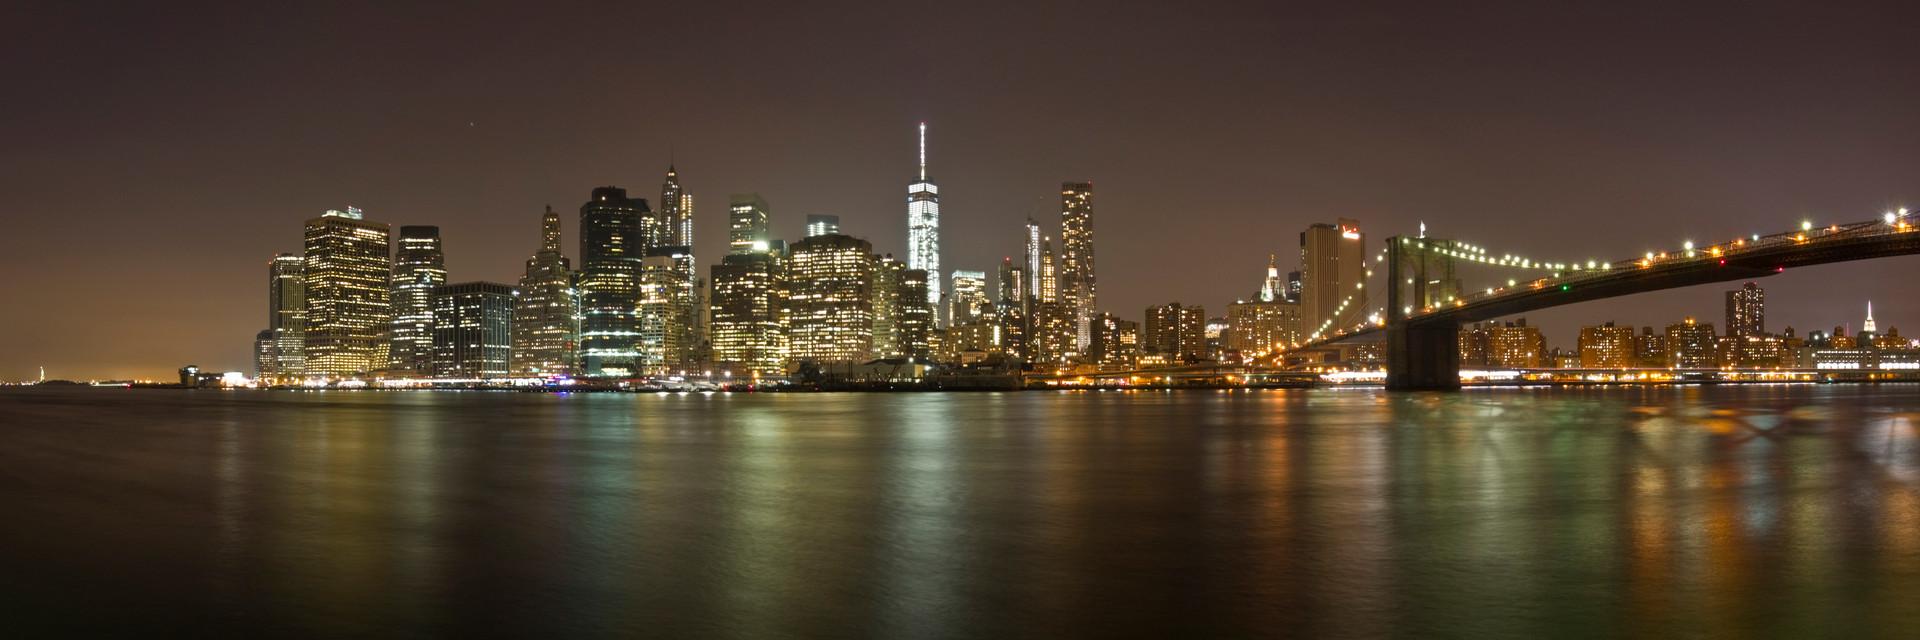 newyork_pano.jpg